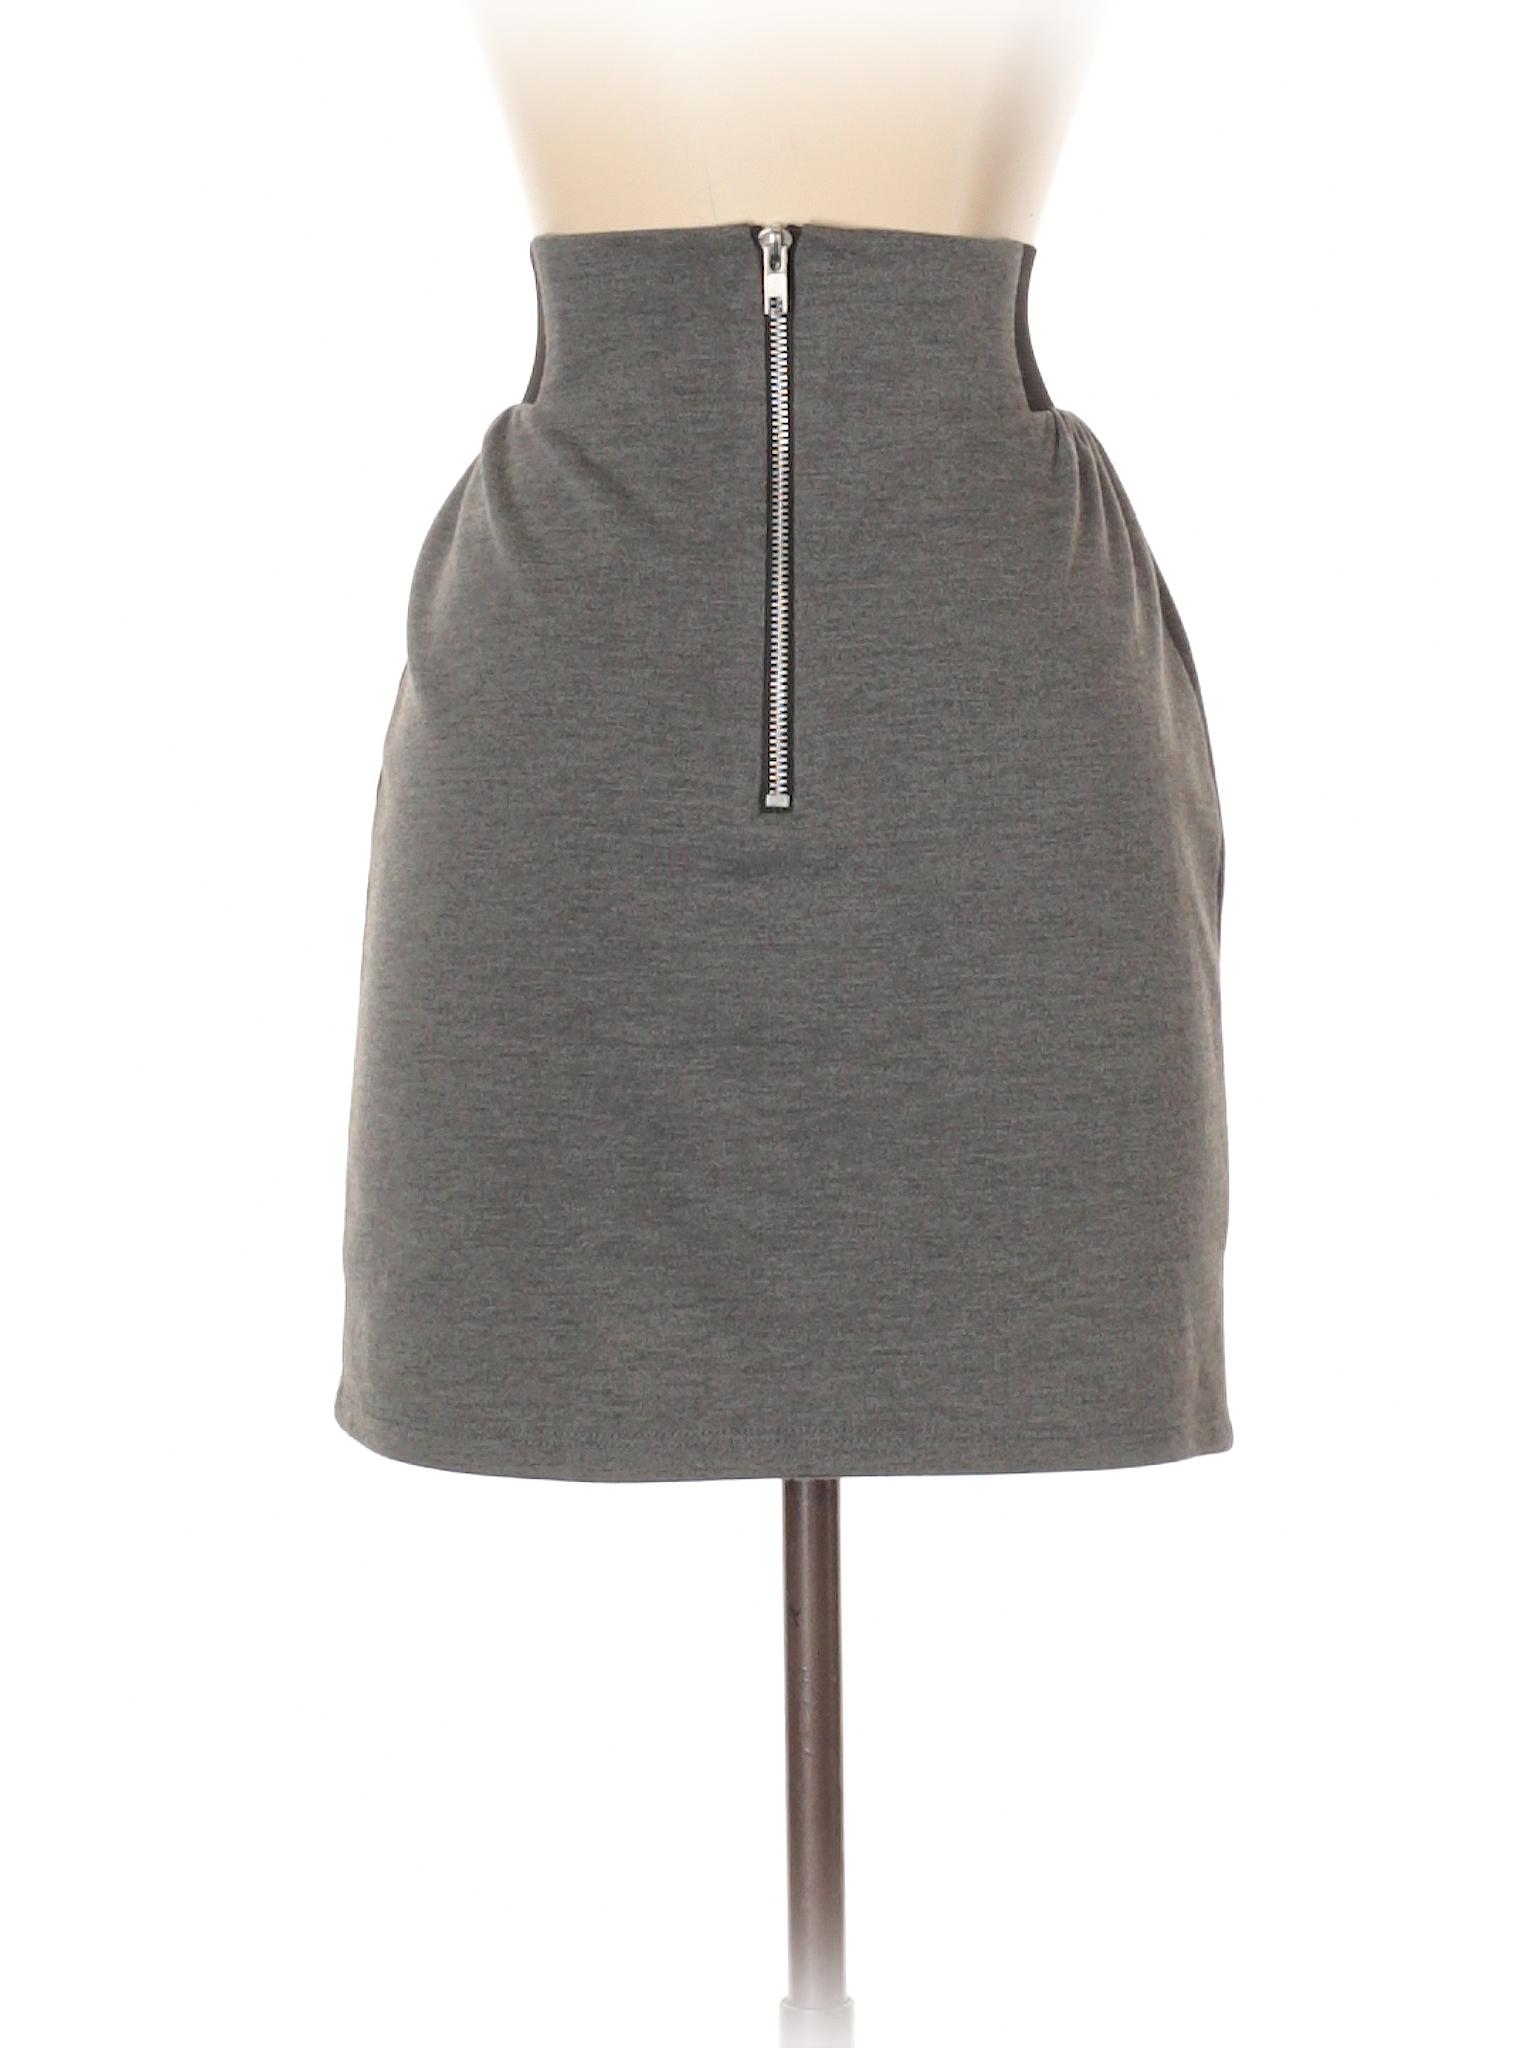 Casual Boutique Skirt Boutique Boutique Skirt Skirt Casual Casual Boutique TwEXwqr45x